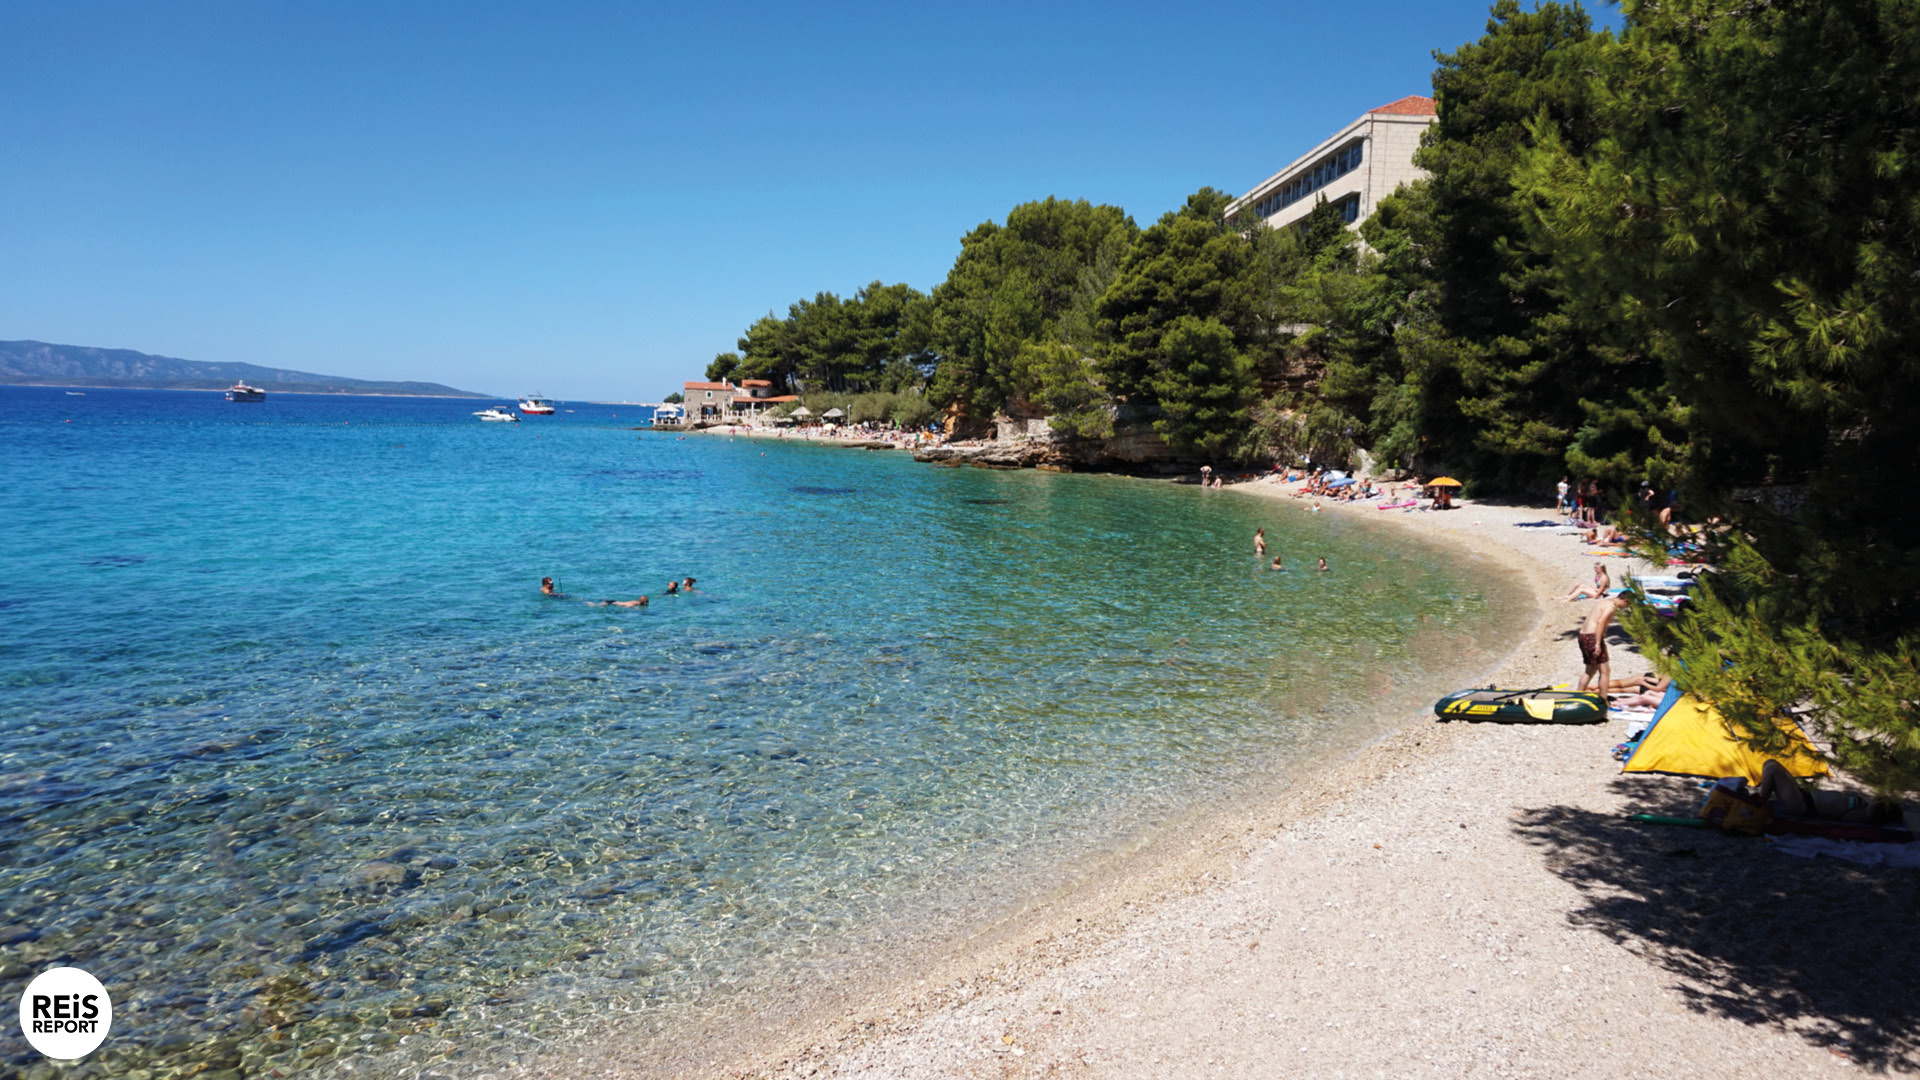 kroatie mooiste stranden top vijf